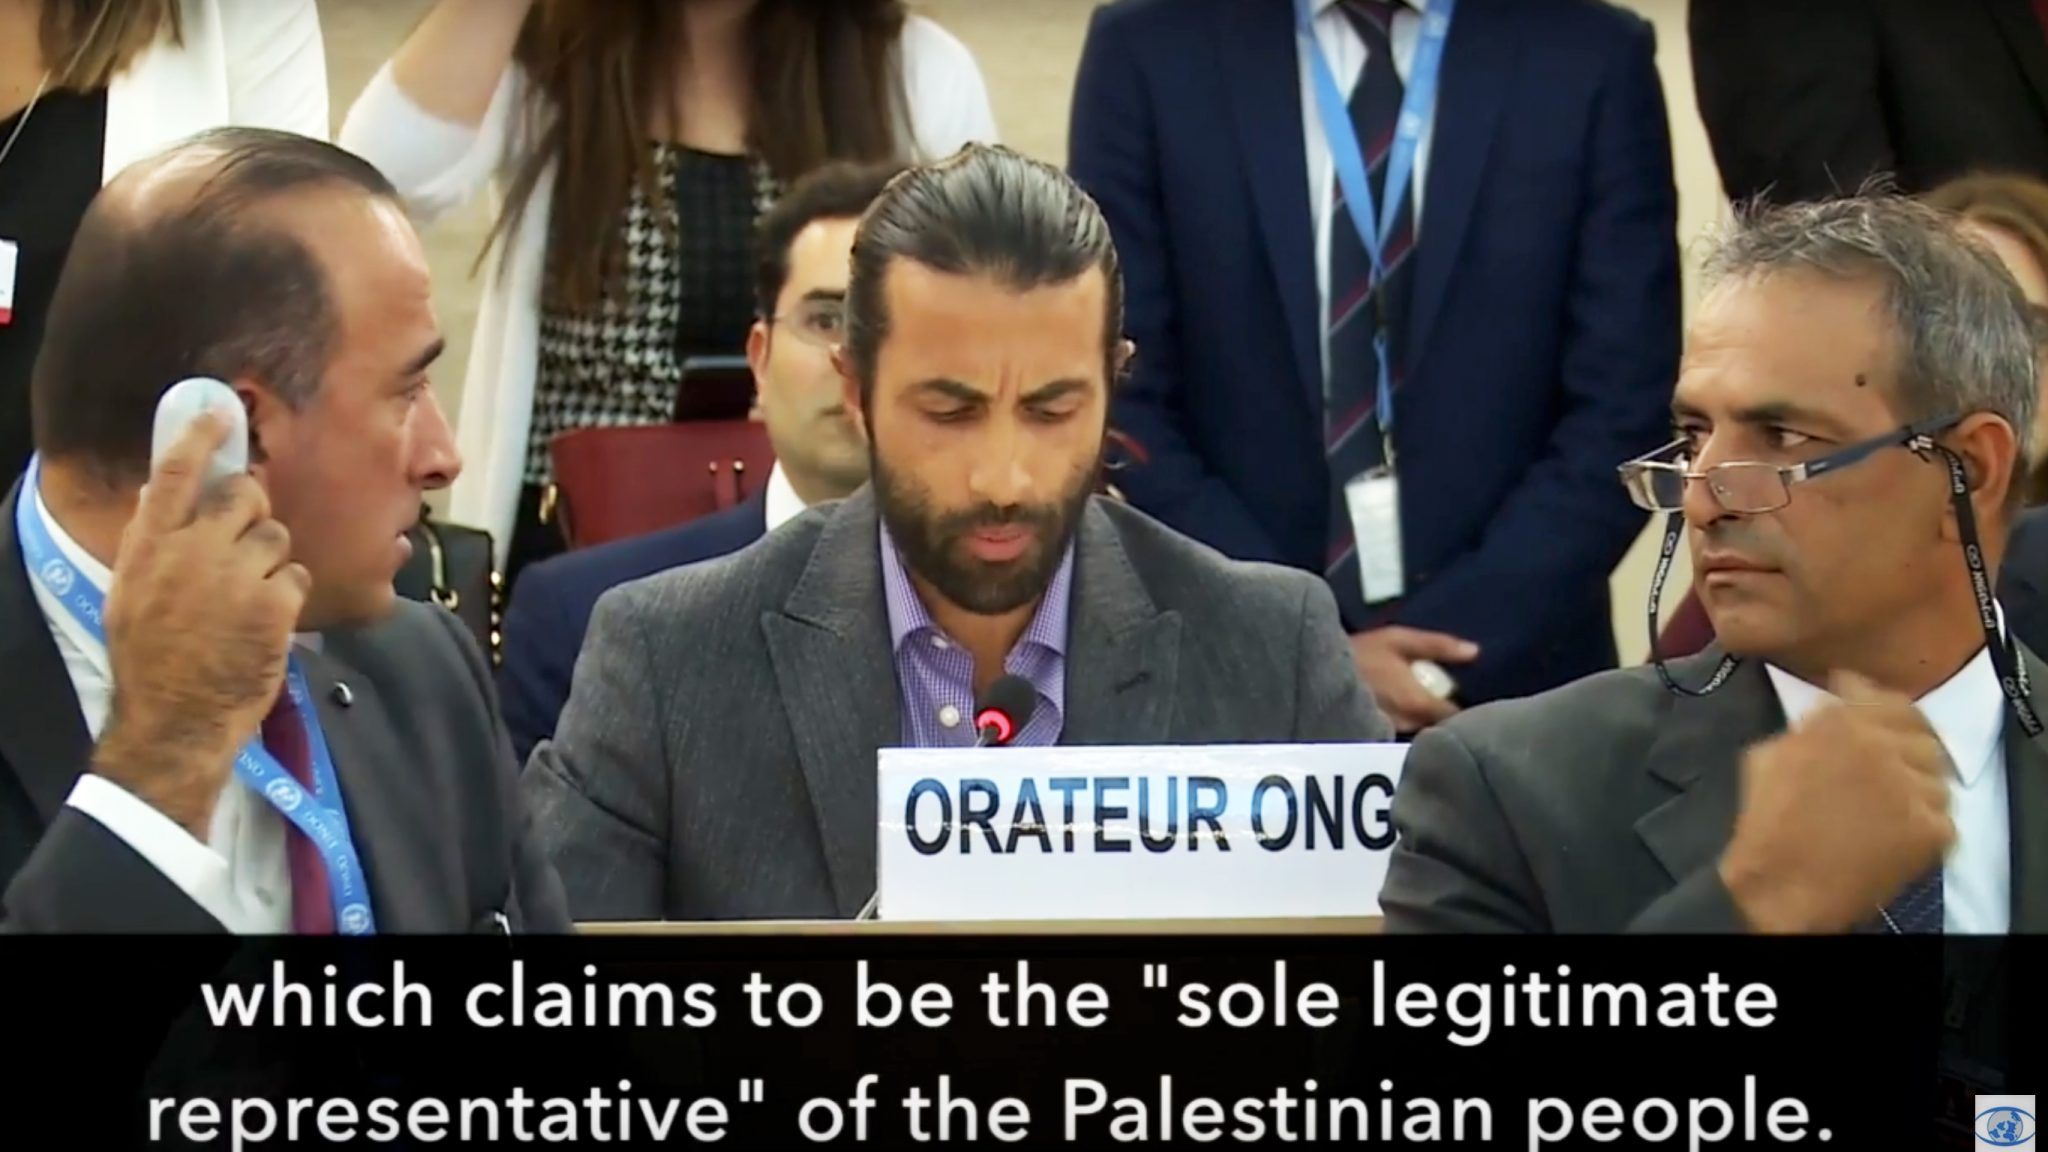 Palestinian exposes lies at UN